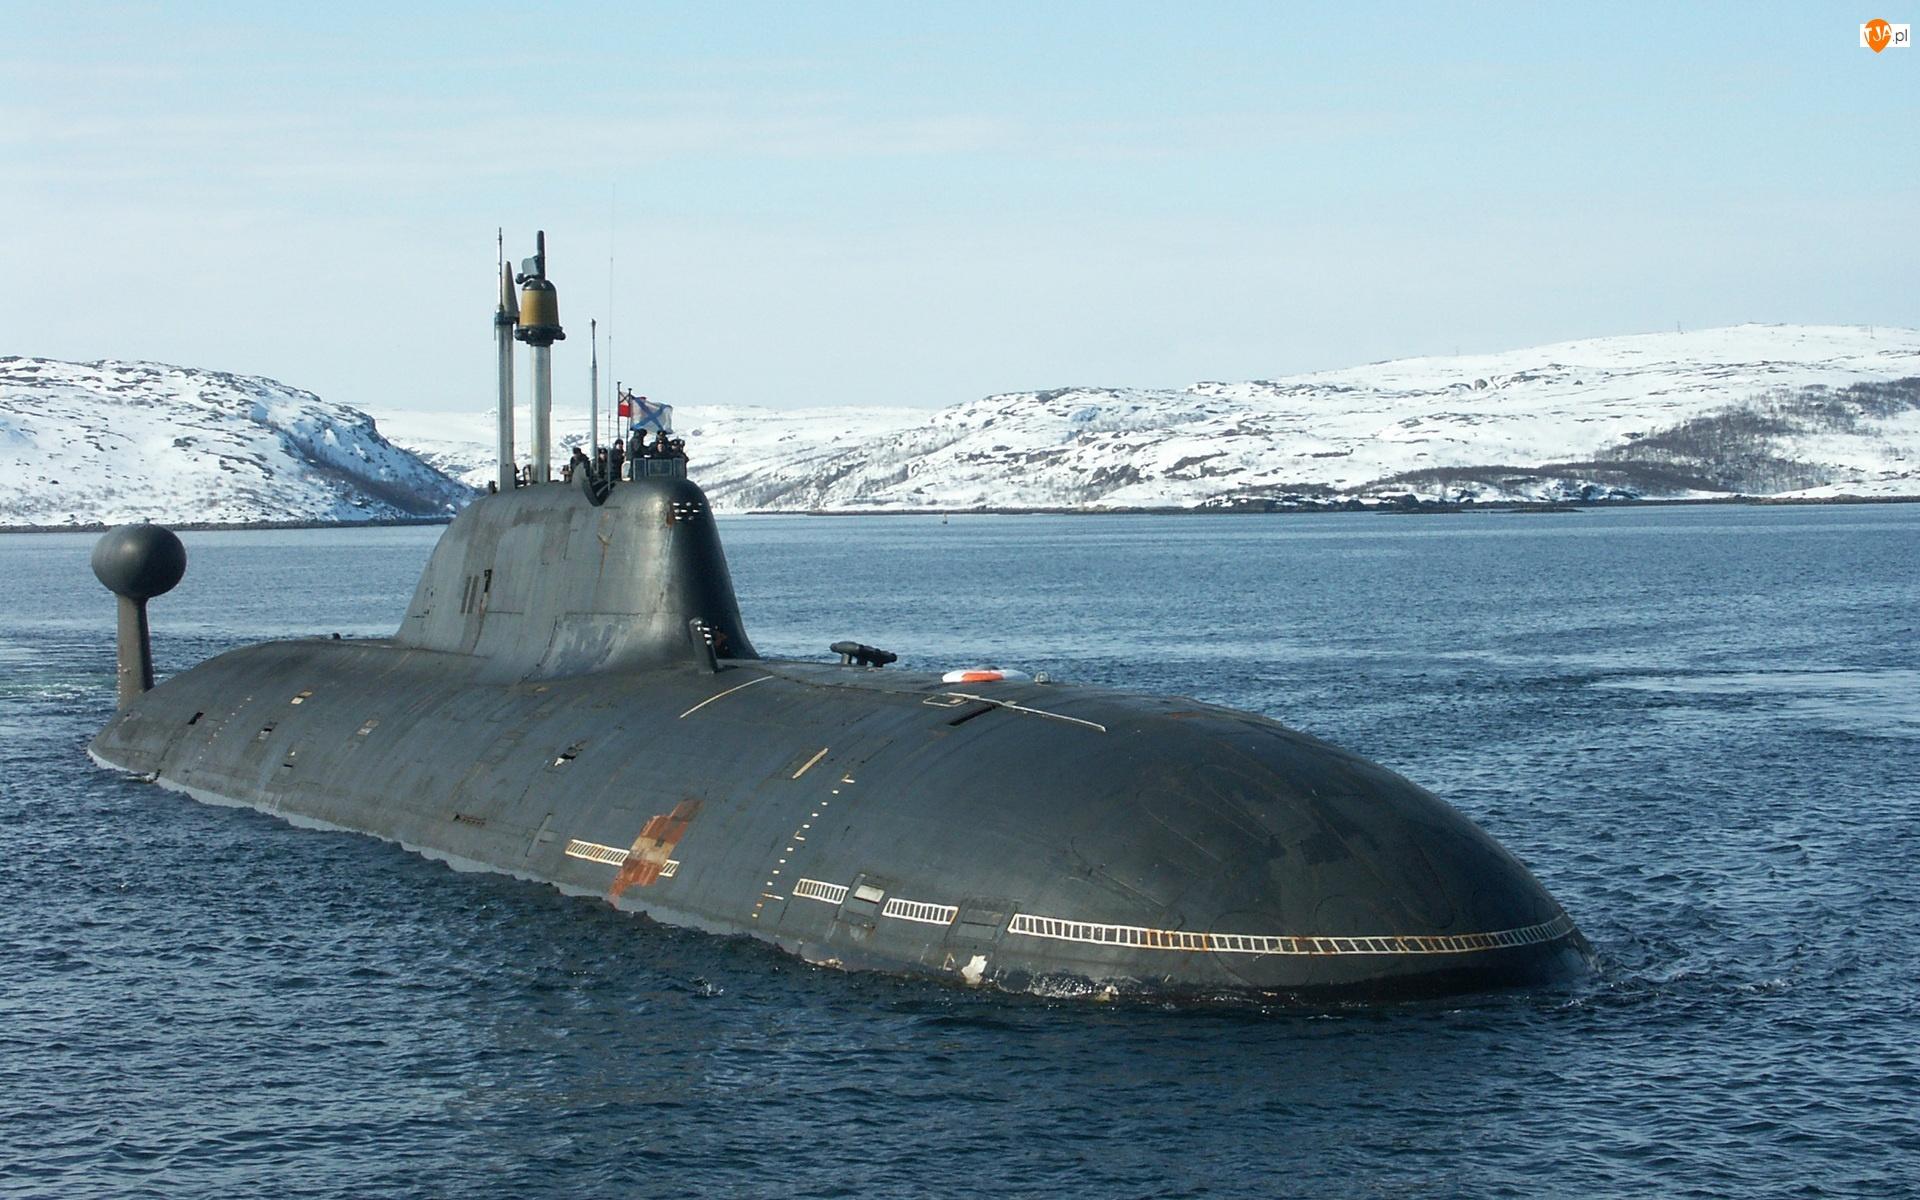 Podwodny, Akuła, Okręt